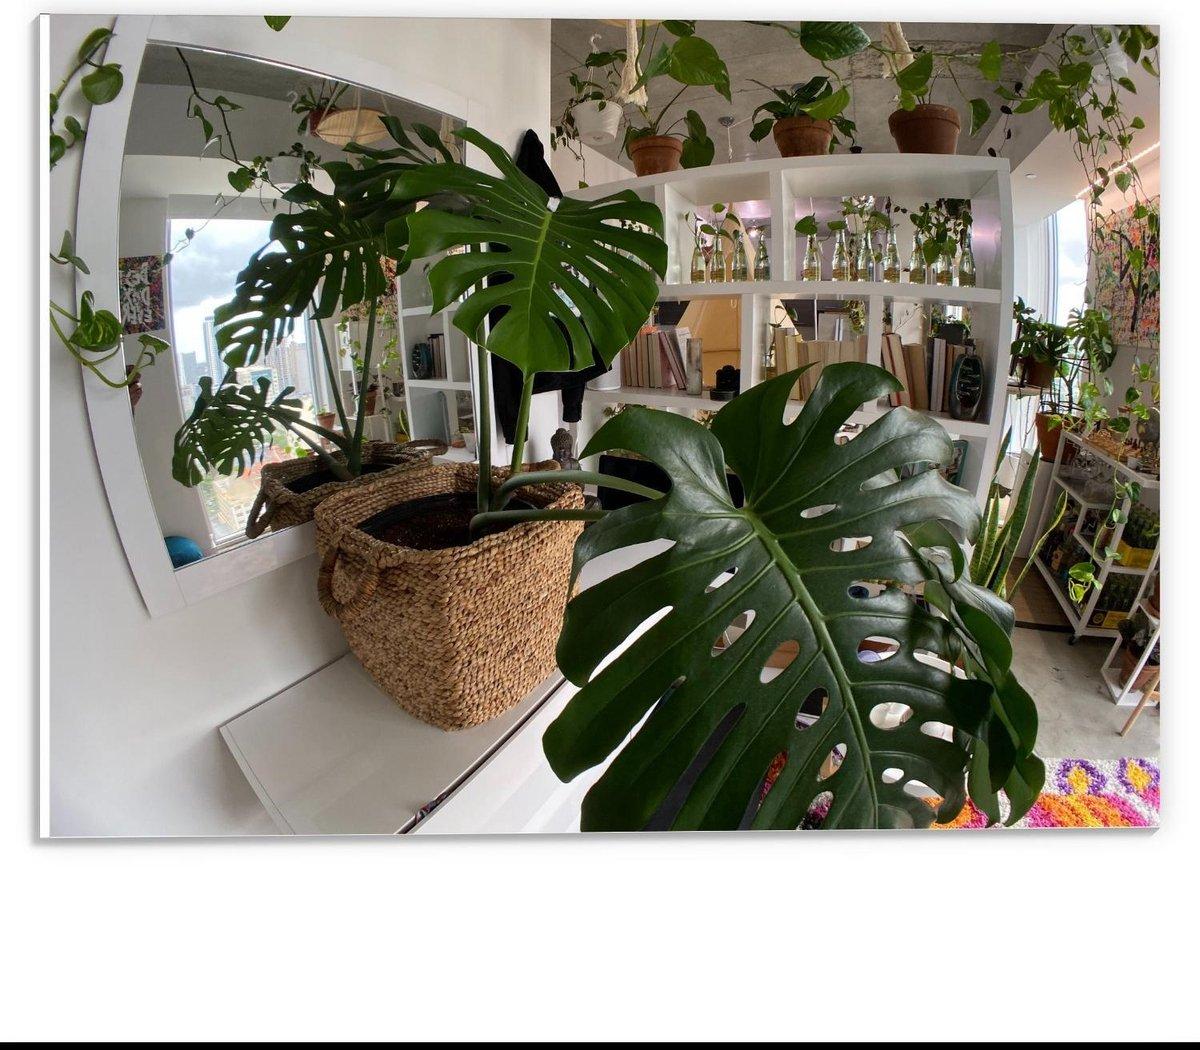 Forex - Woning gevuld met Planten - 40x30cm Foto op Forex